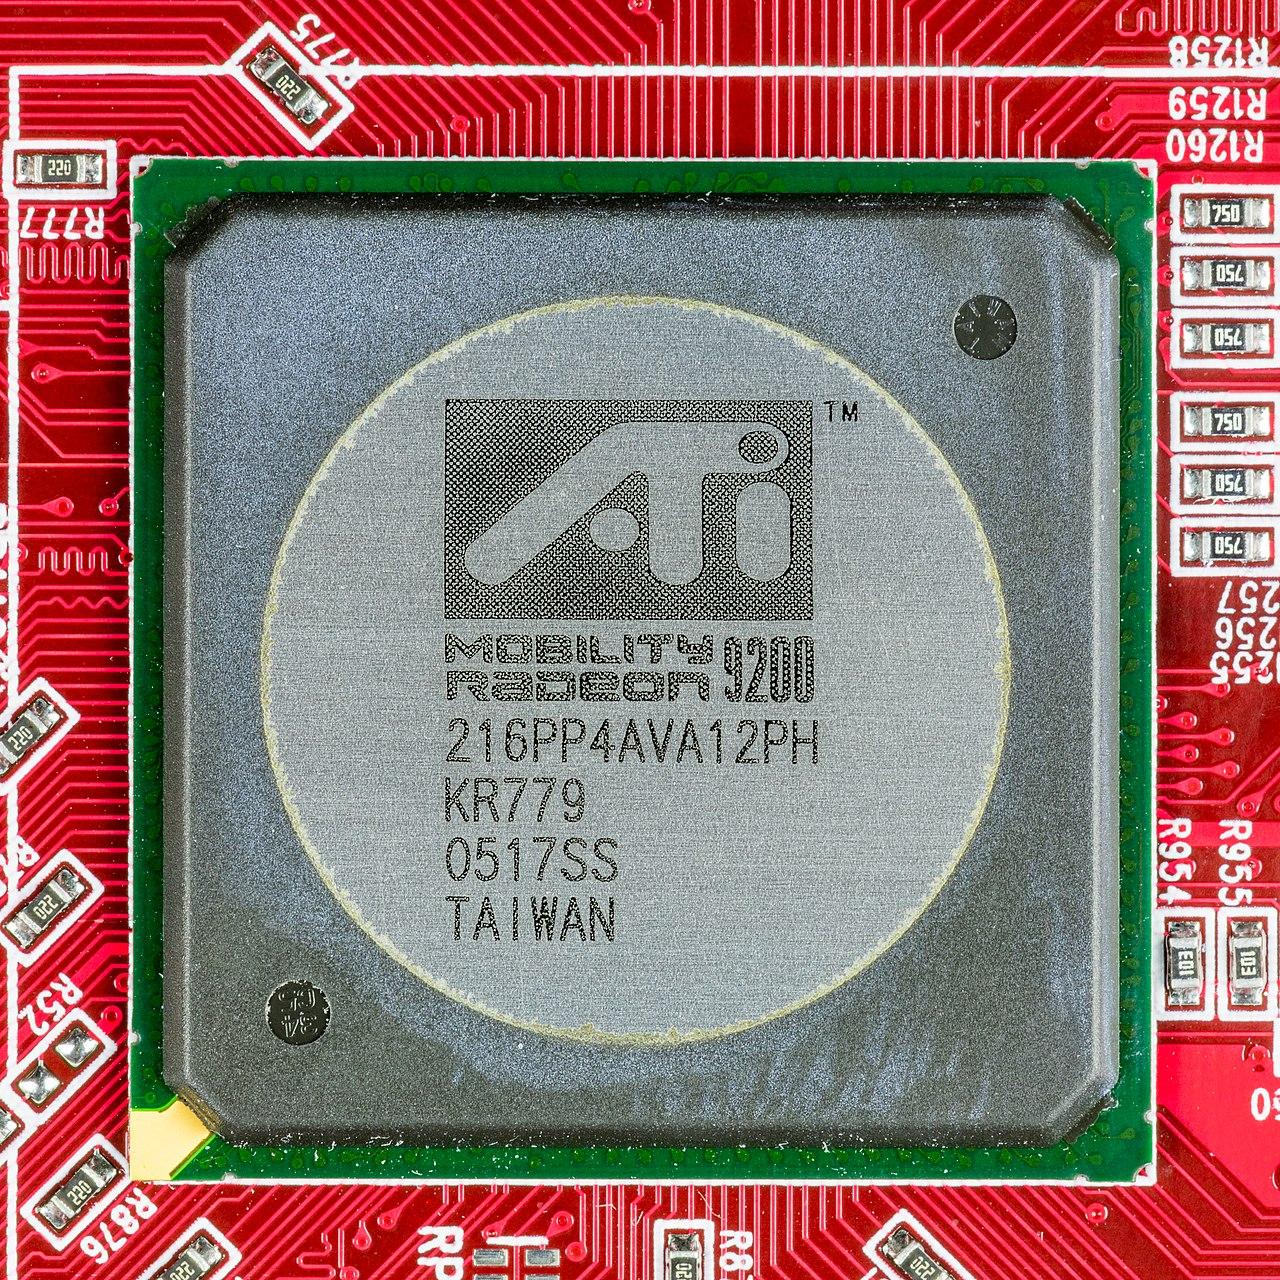 ATI Radeon R9250 128MB 64Bit - ATI Mobility Radeon 9200 216PP4AVA12PH